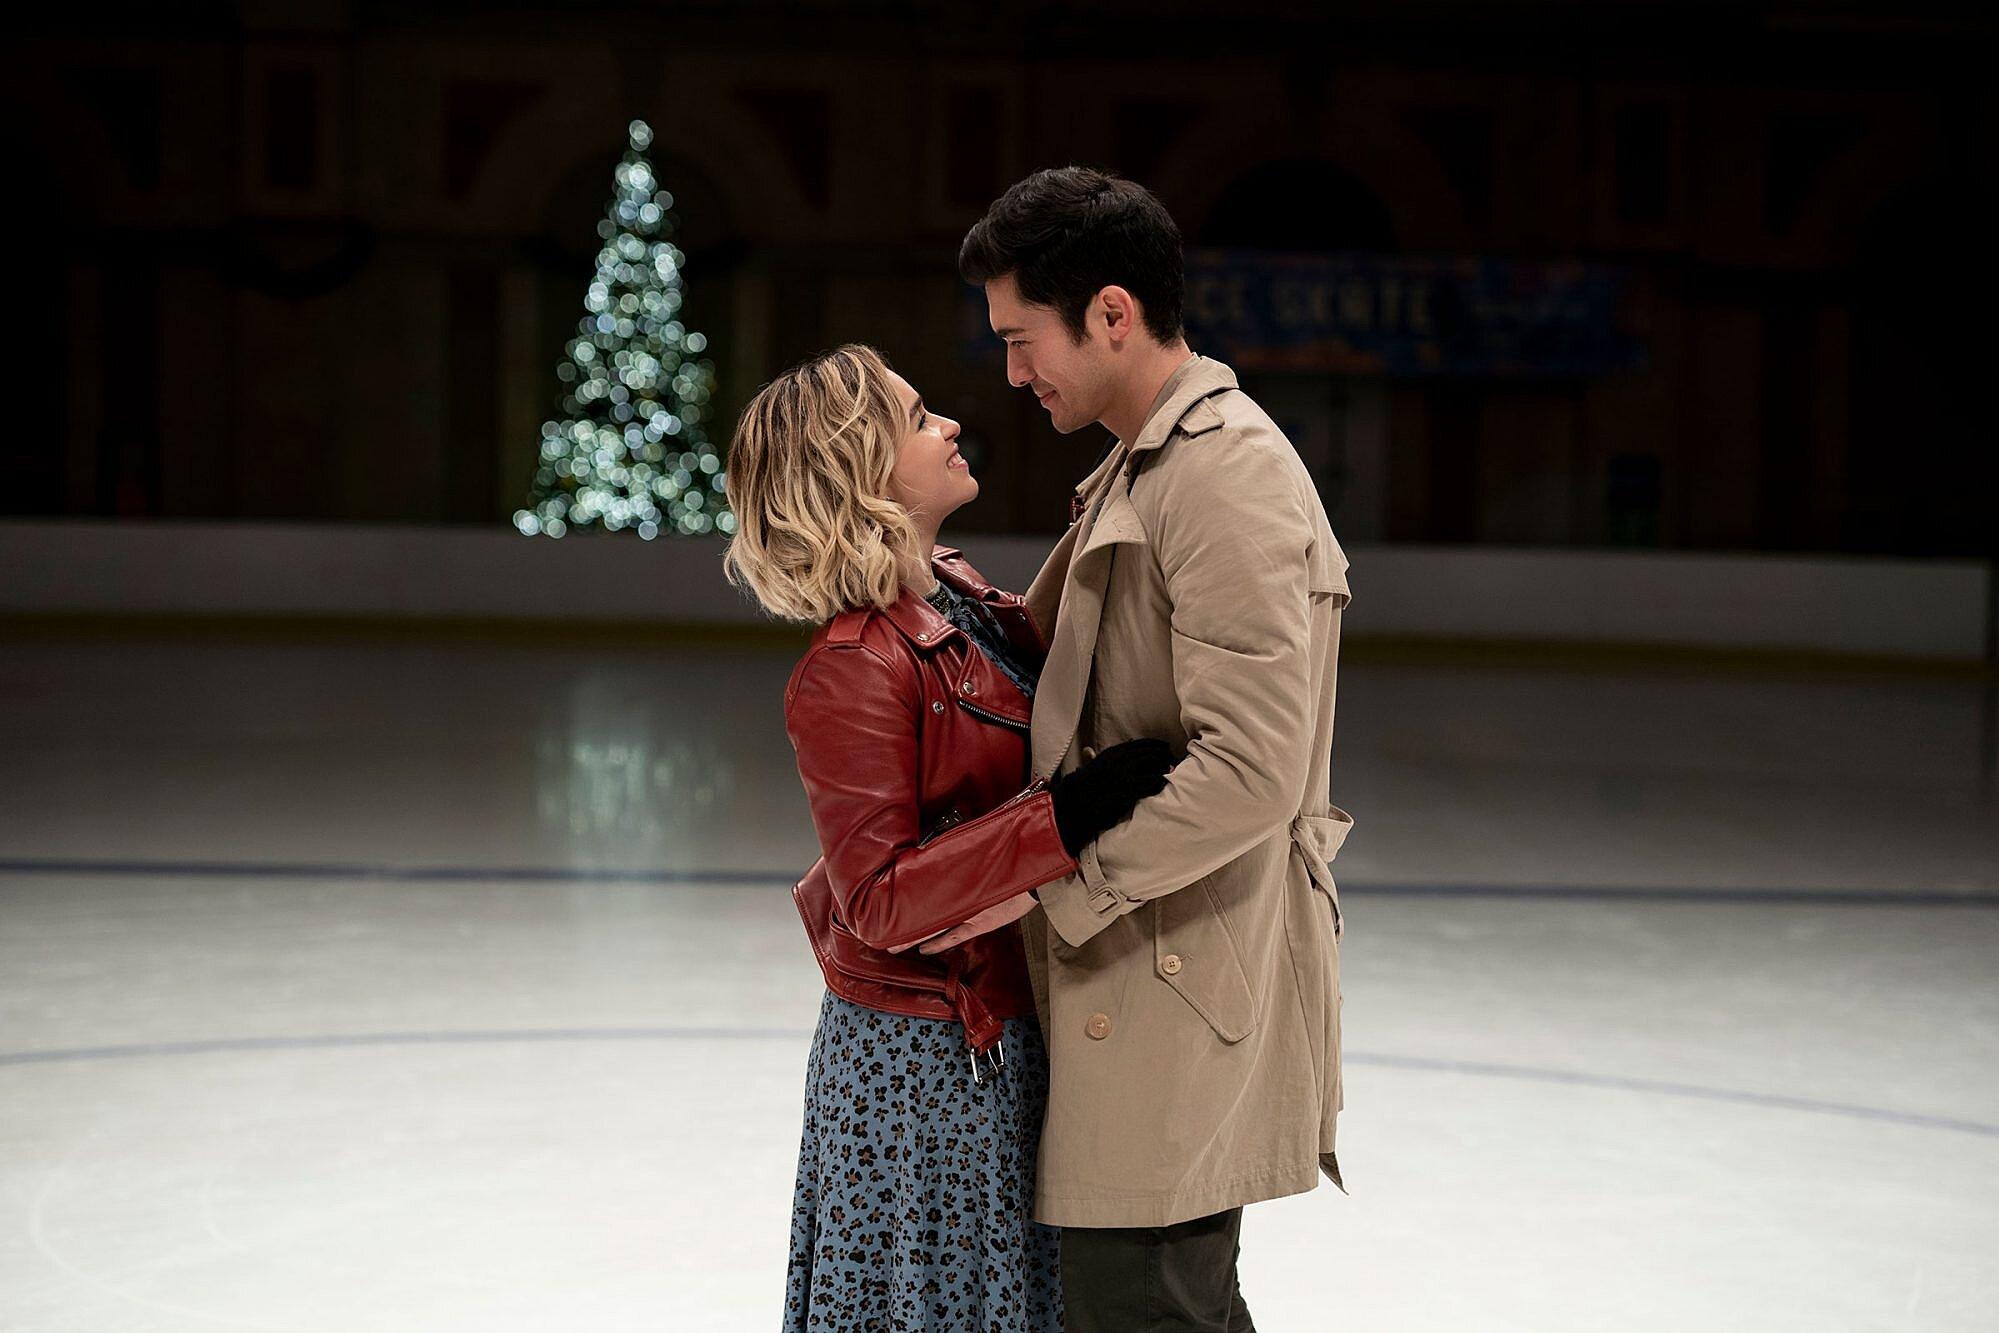 Last Christmas Is The Best Bad Movie Of 2019 Ew Com